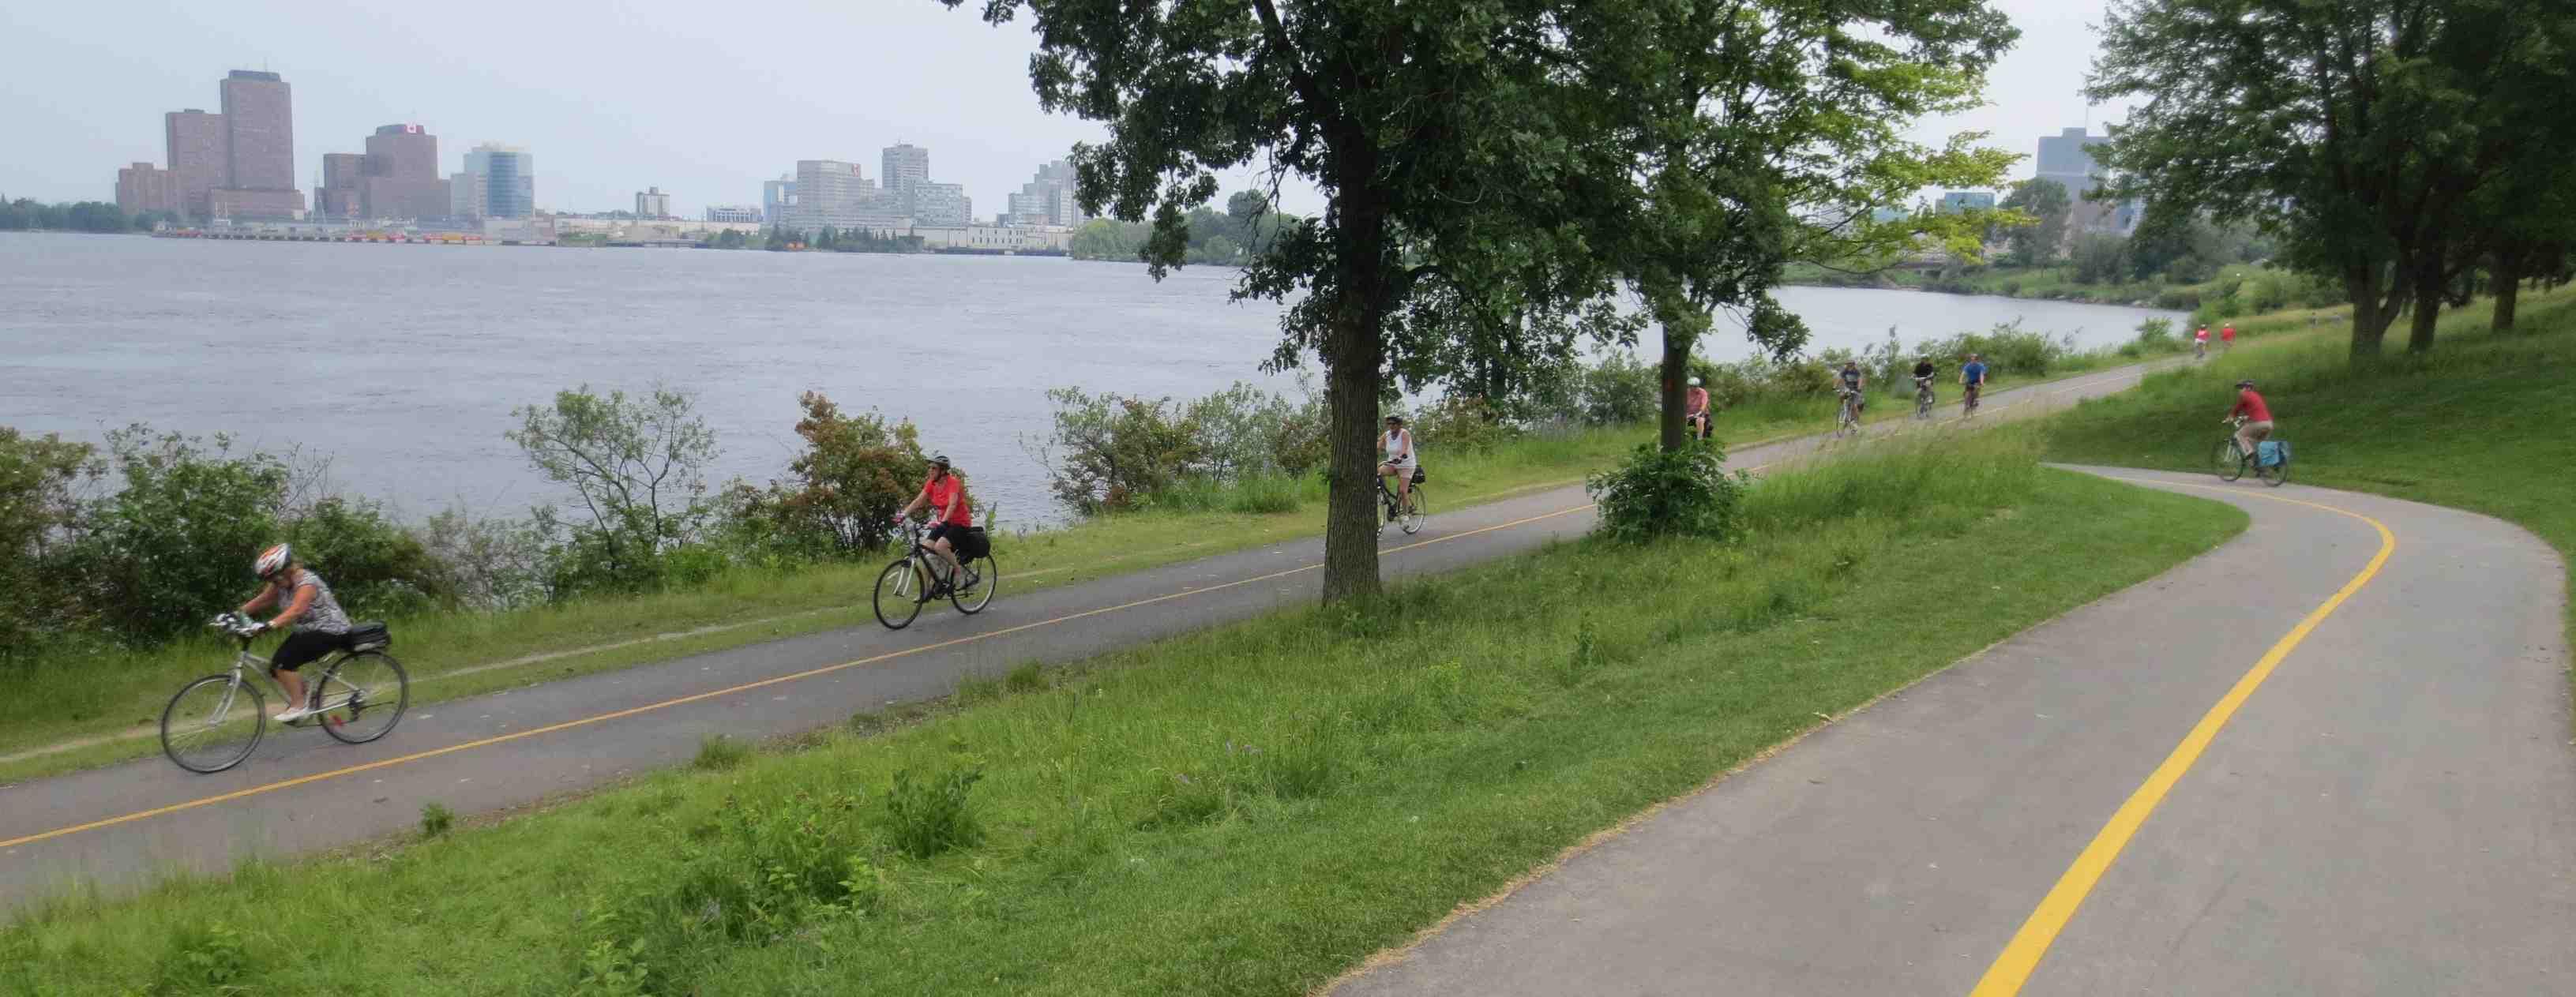 2013 07 01 Bike Ottawa Canada Day 05